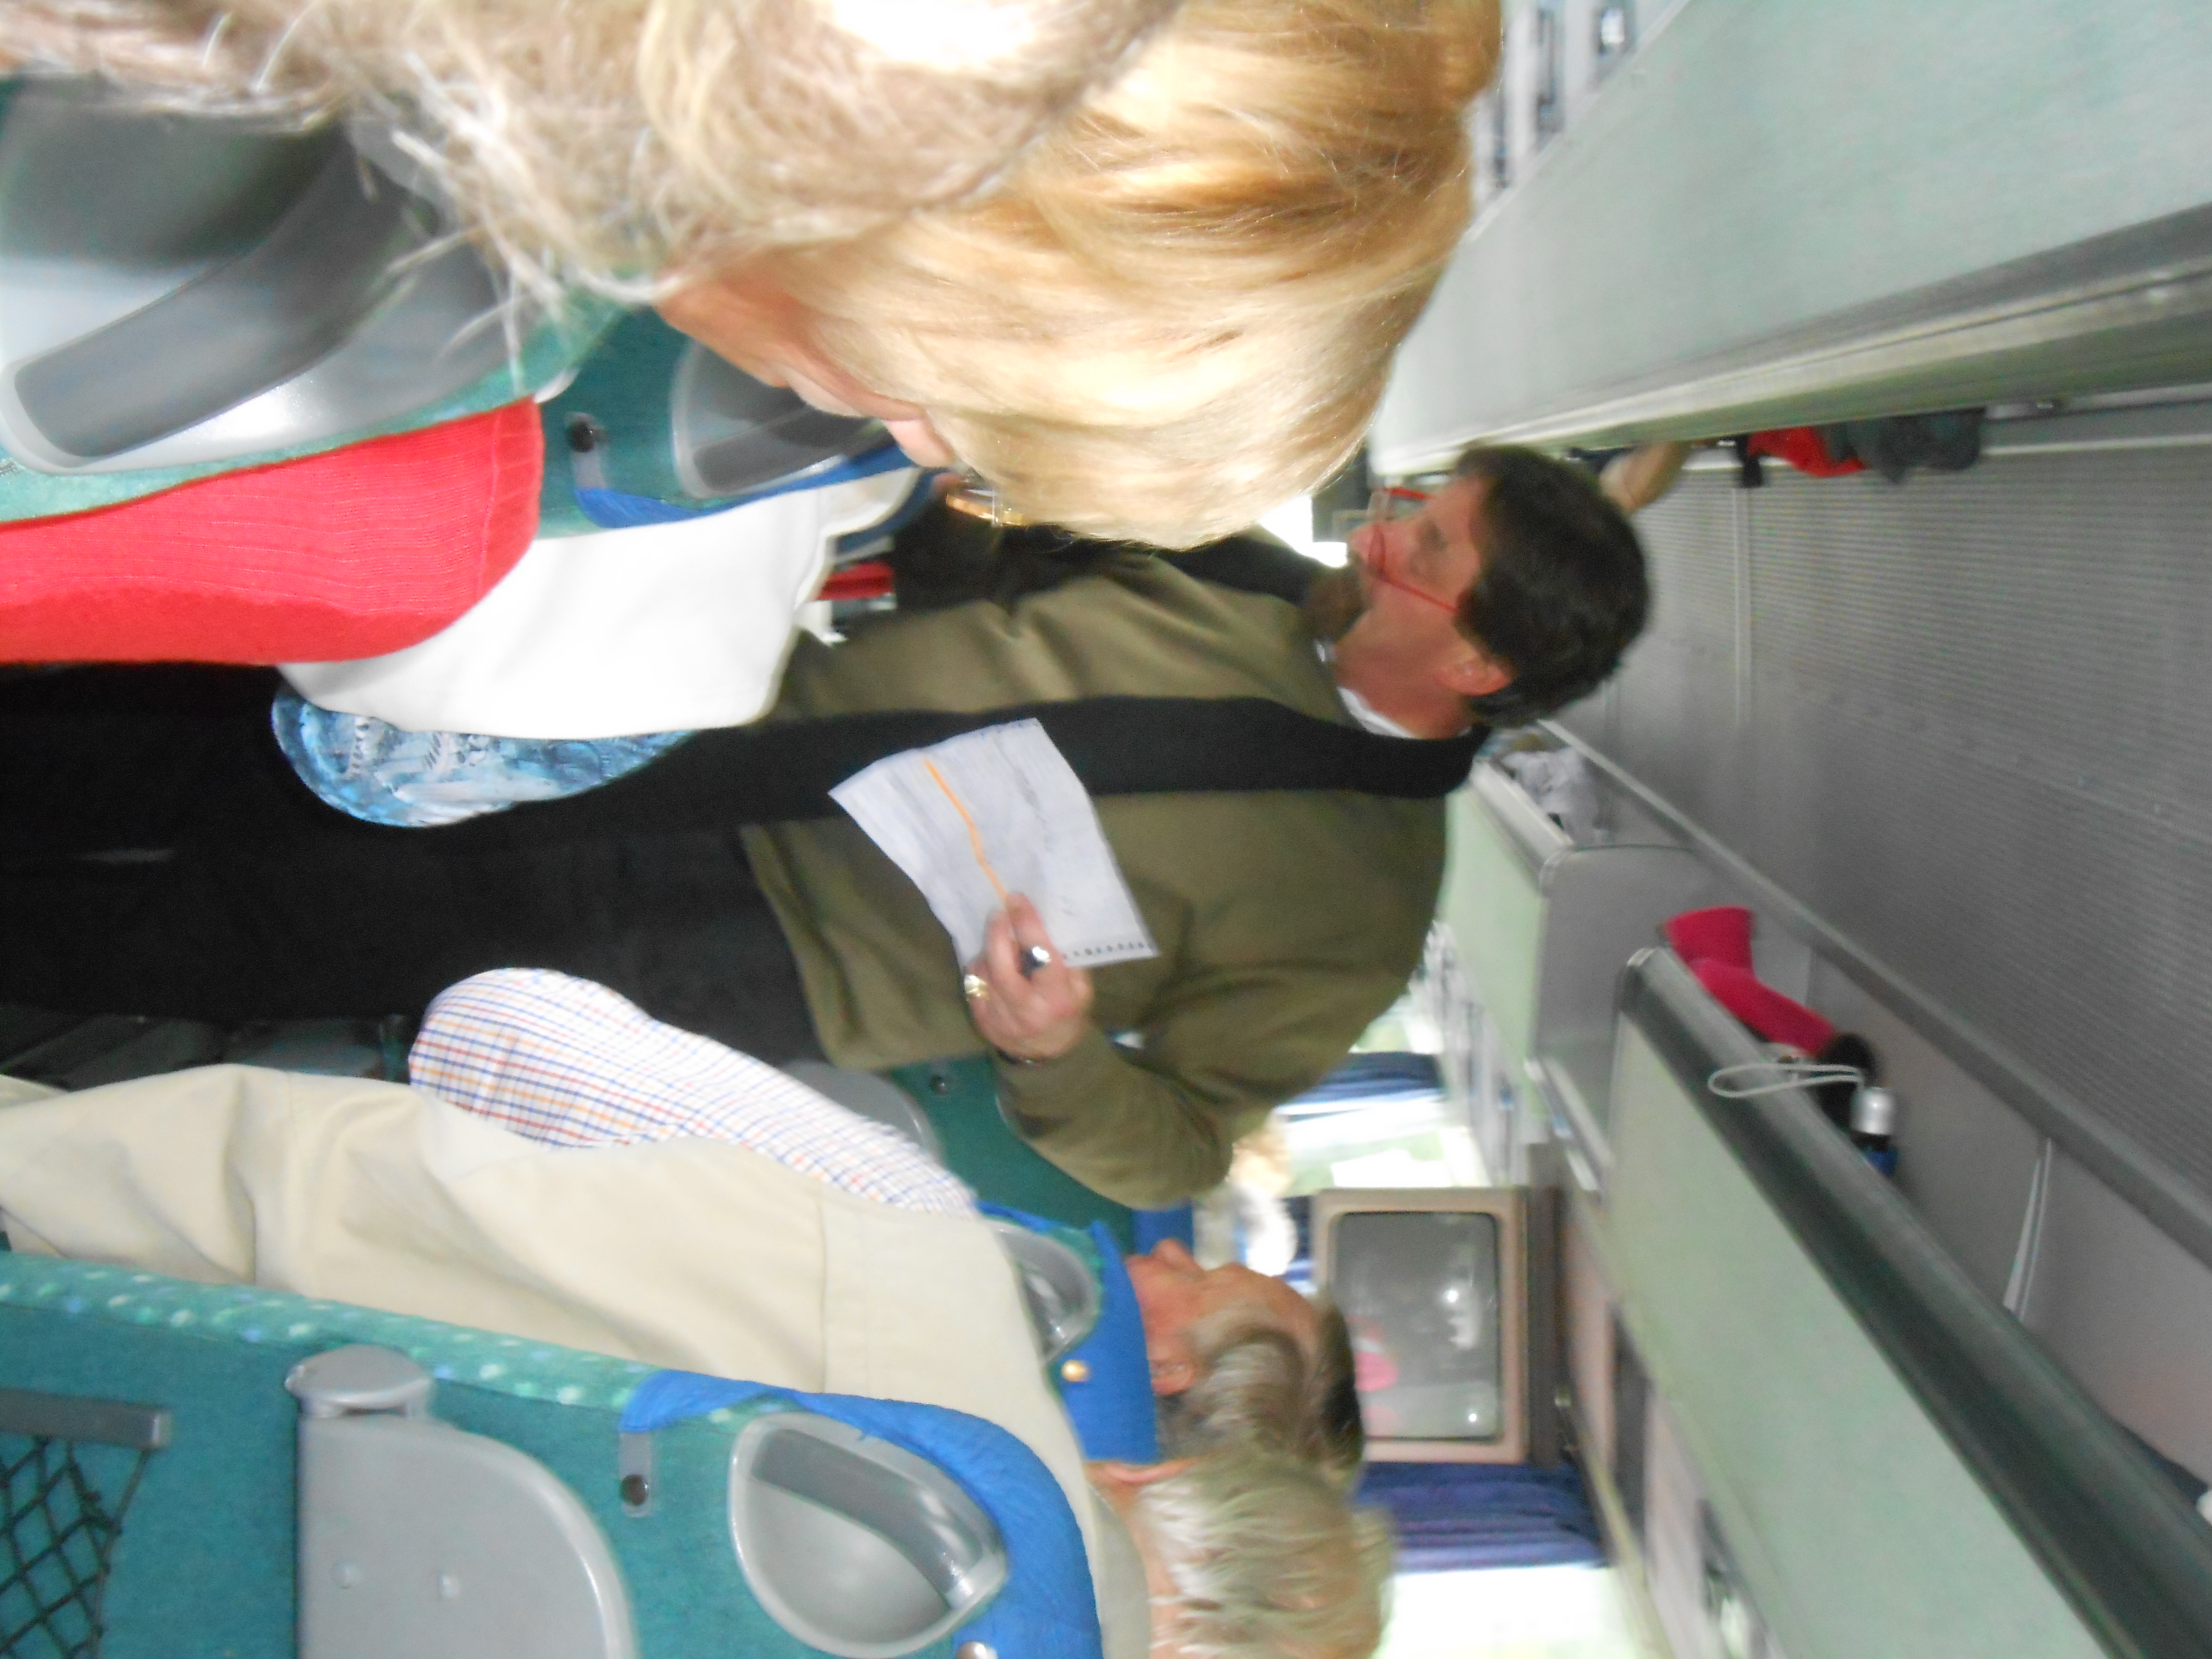 Busfahrt Amsterdam (18)